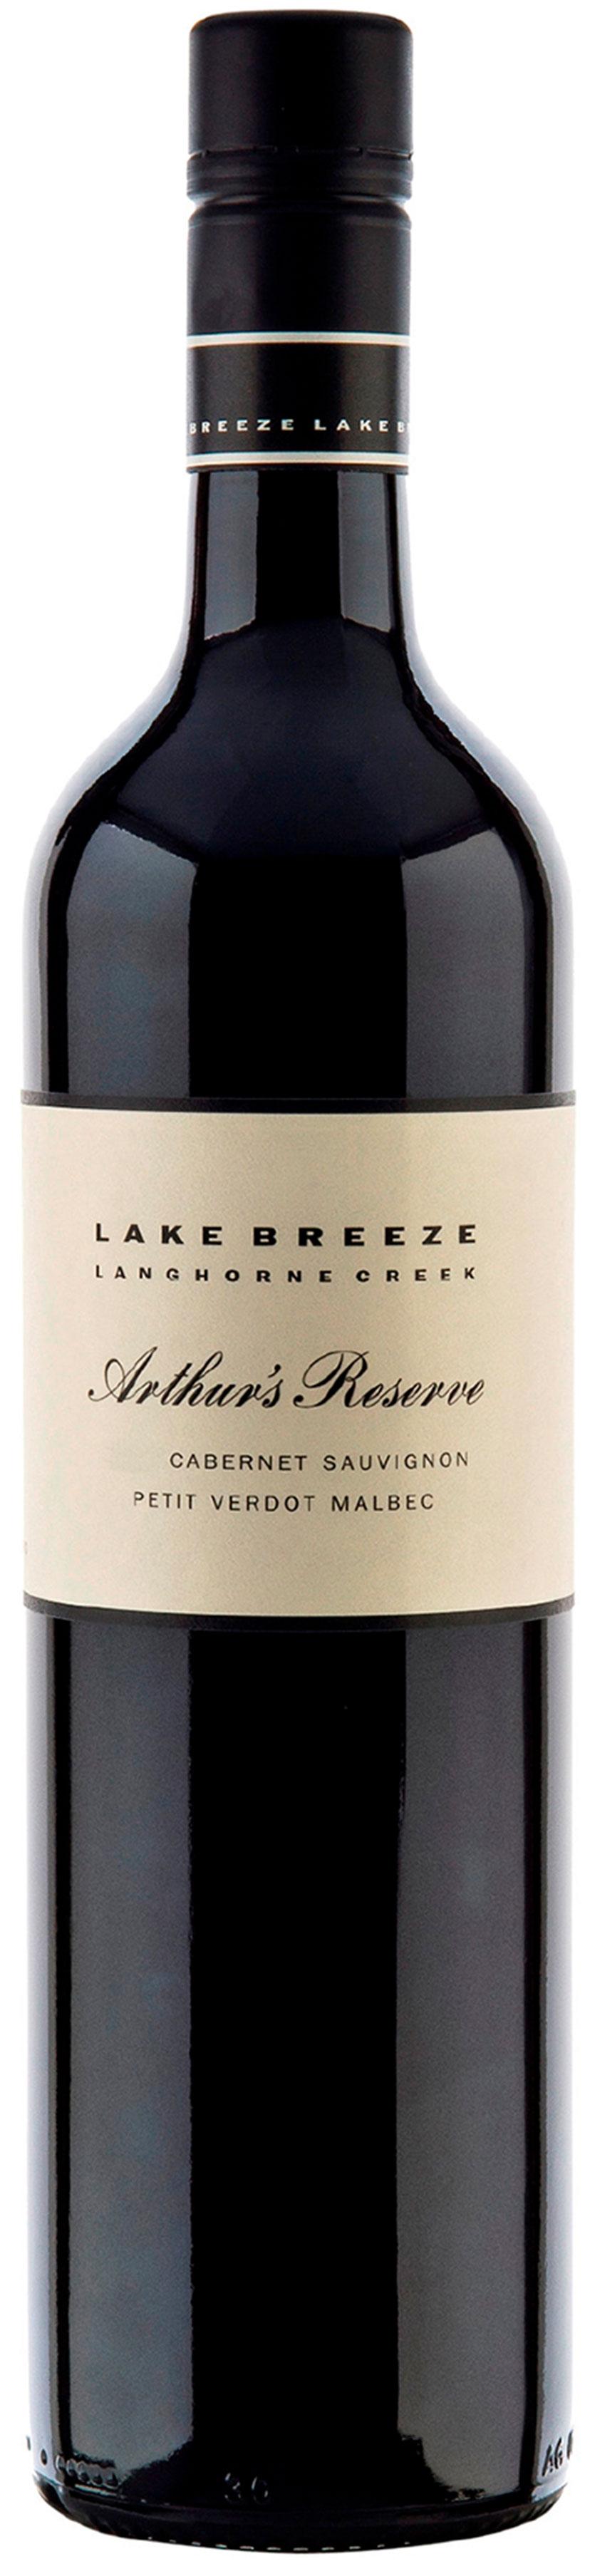 https://vinocorpperu.com/images/vinos/lakebreeze/arthurs_reserve_cabernet_sauvignon_90_petit_verdot_5_malbec_5.jpg